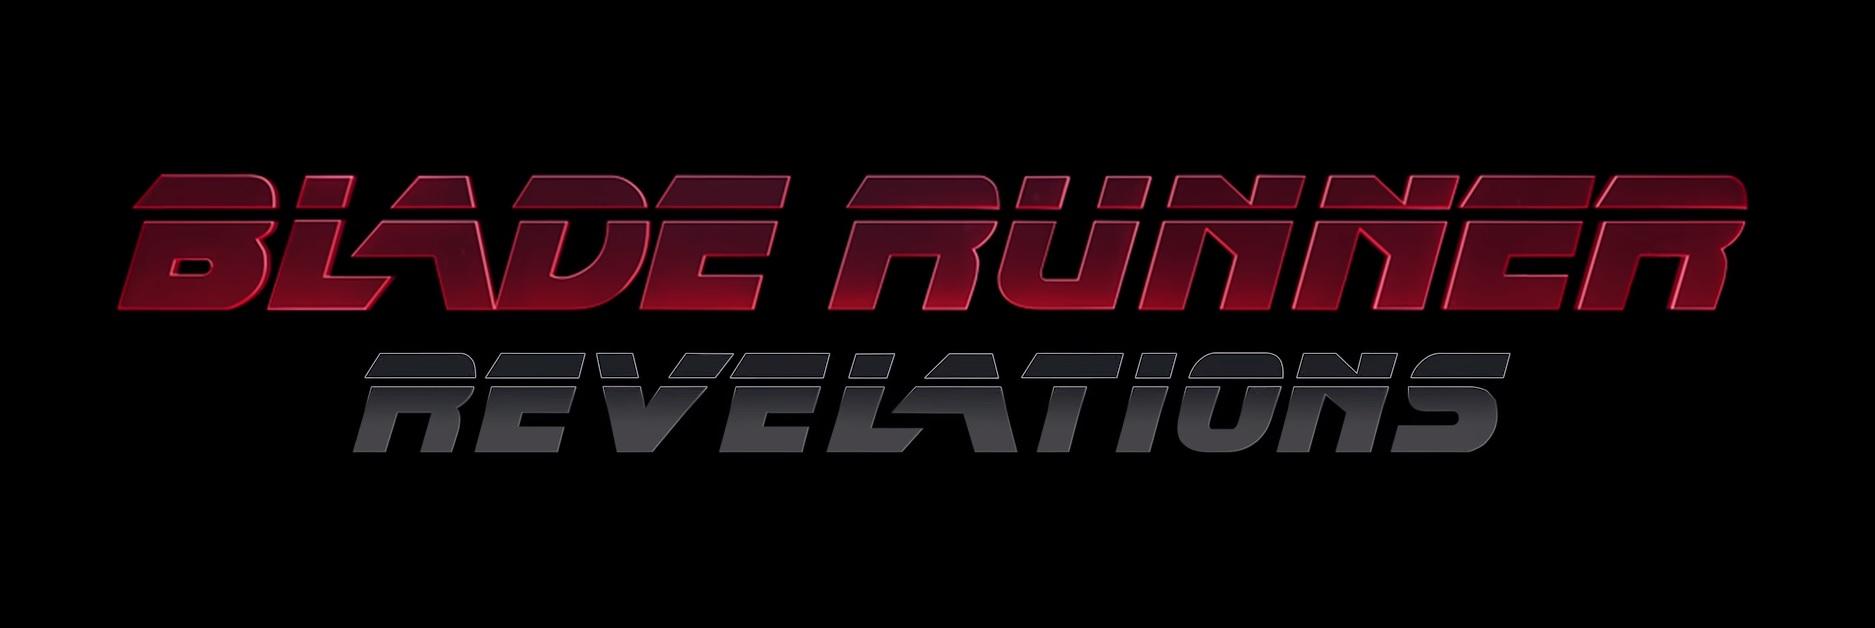 Blade Runner: Revelations ya dispone de nuevo trailer